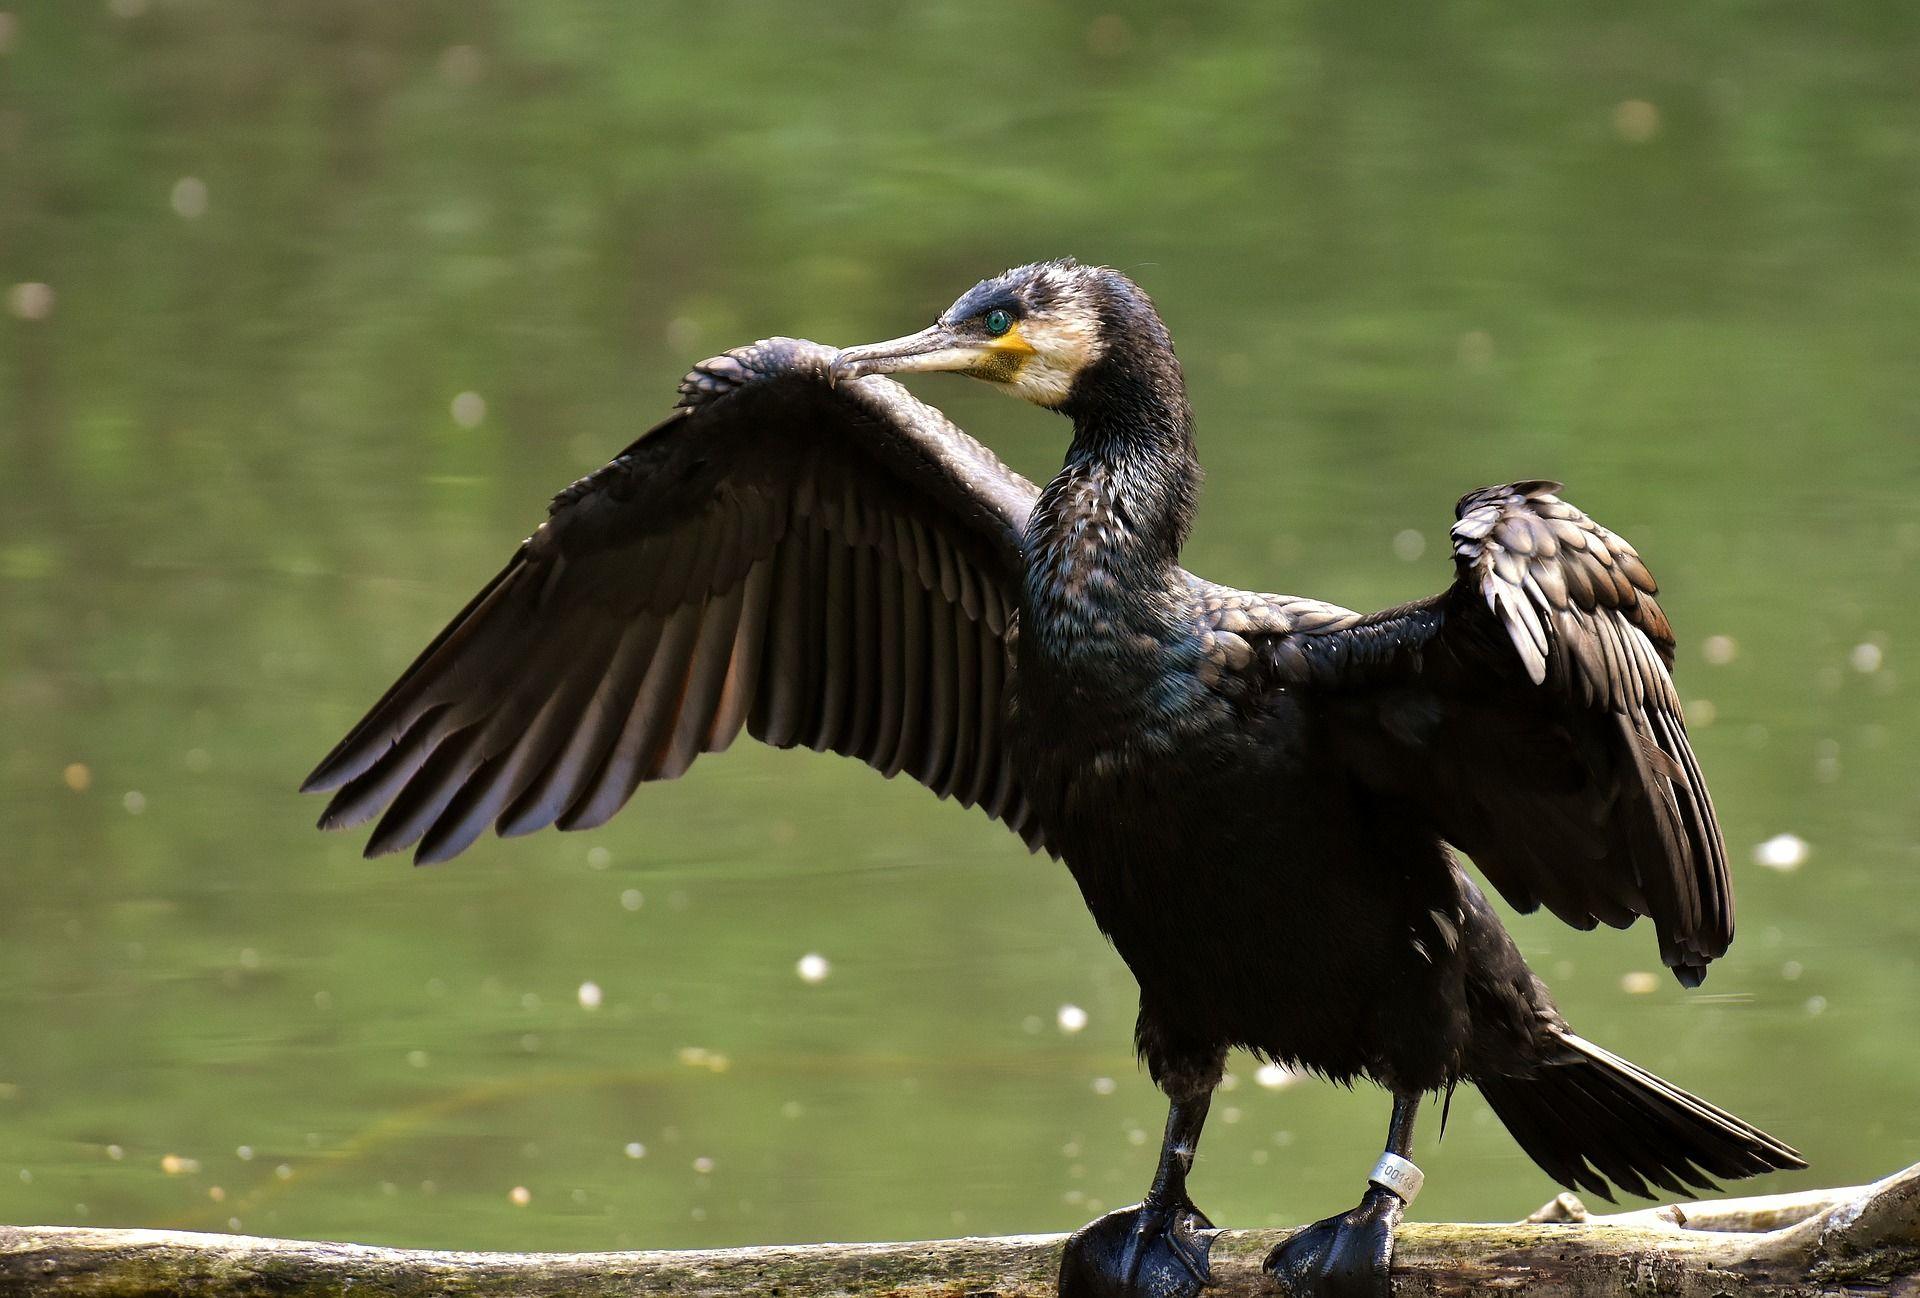 Красивое фото птицы баклана